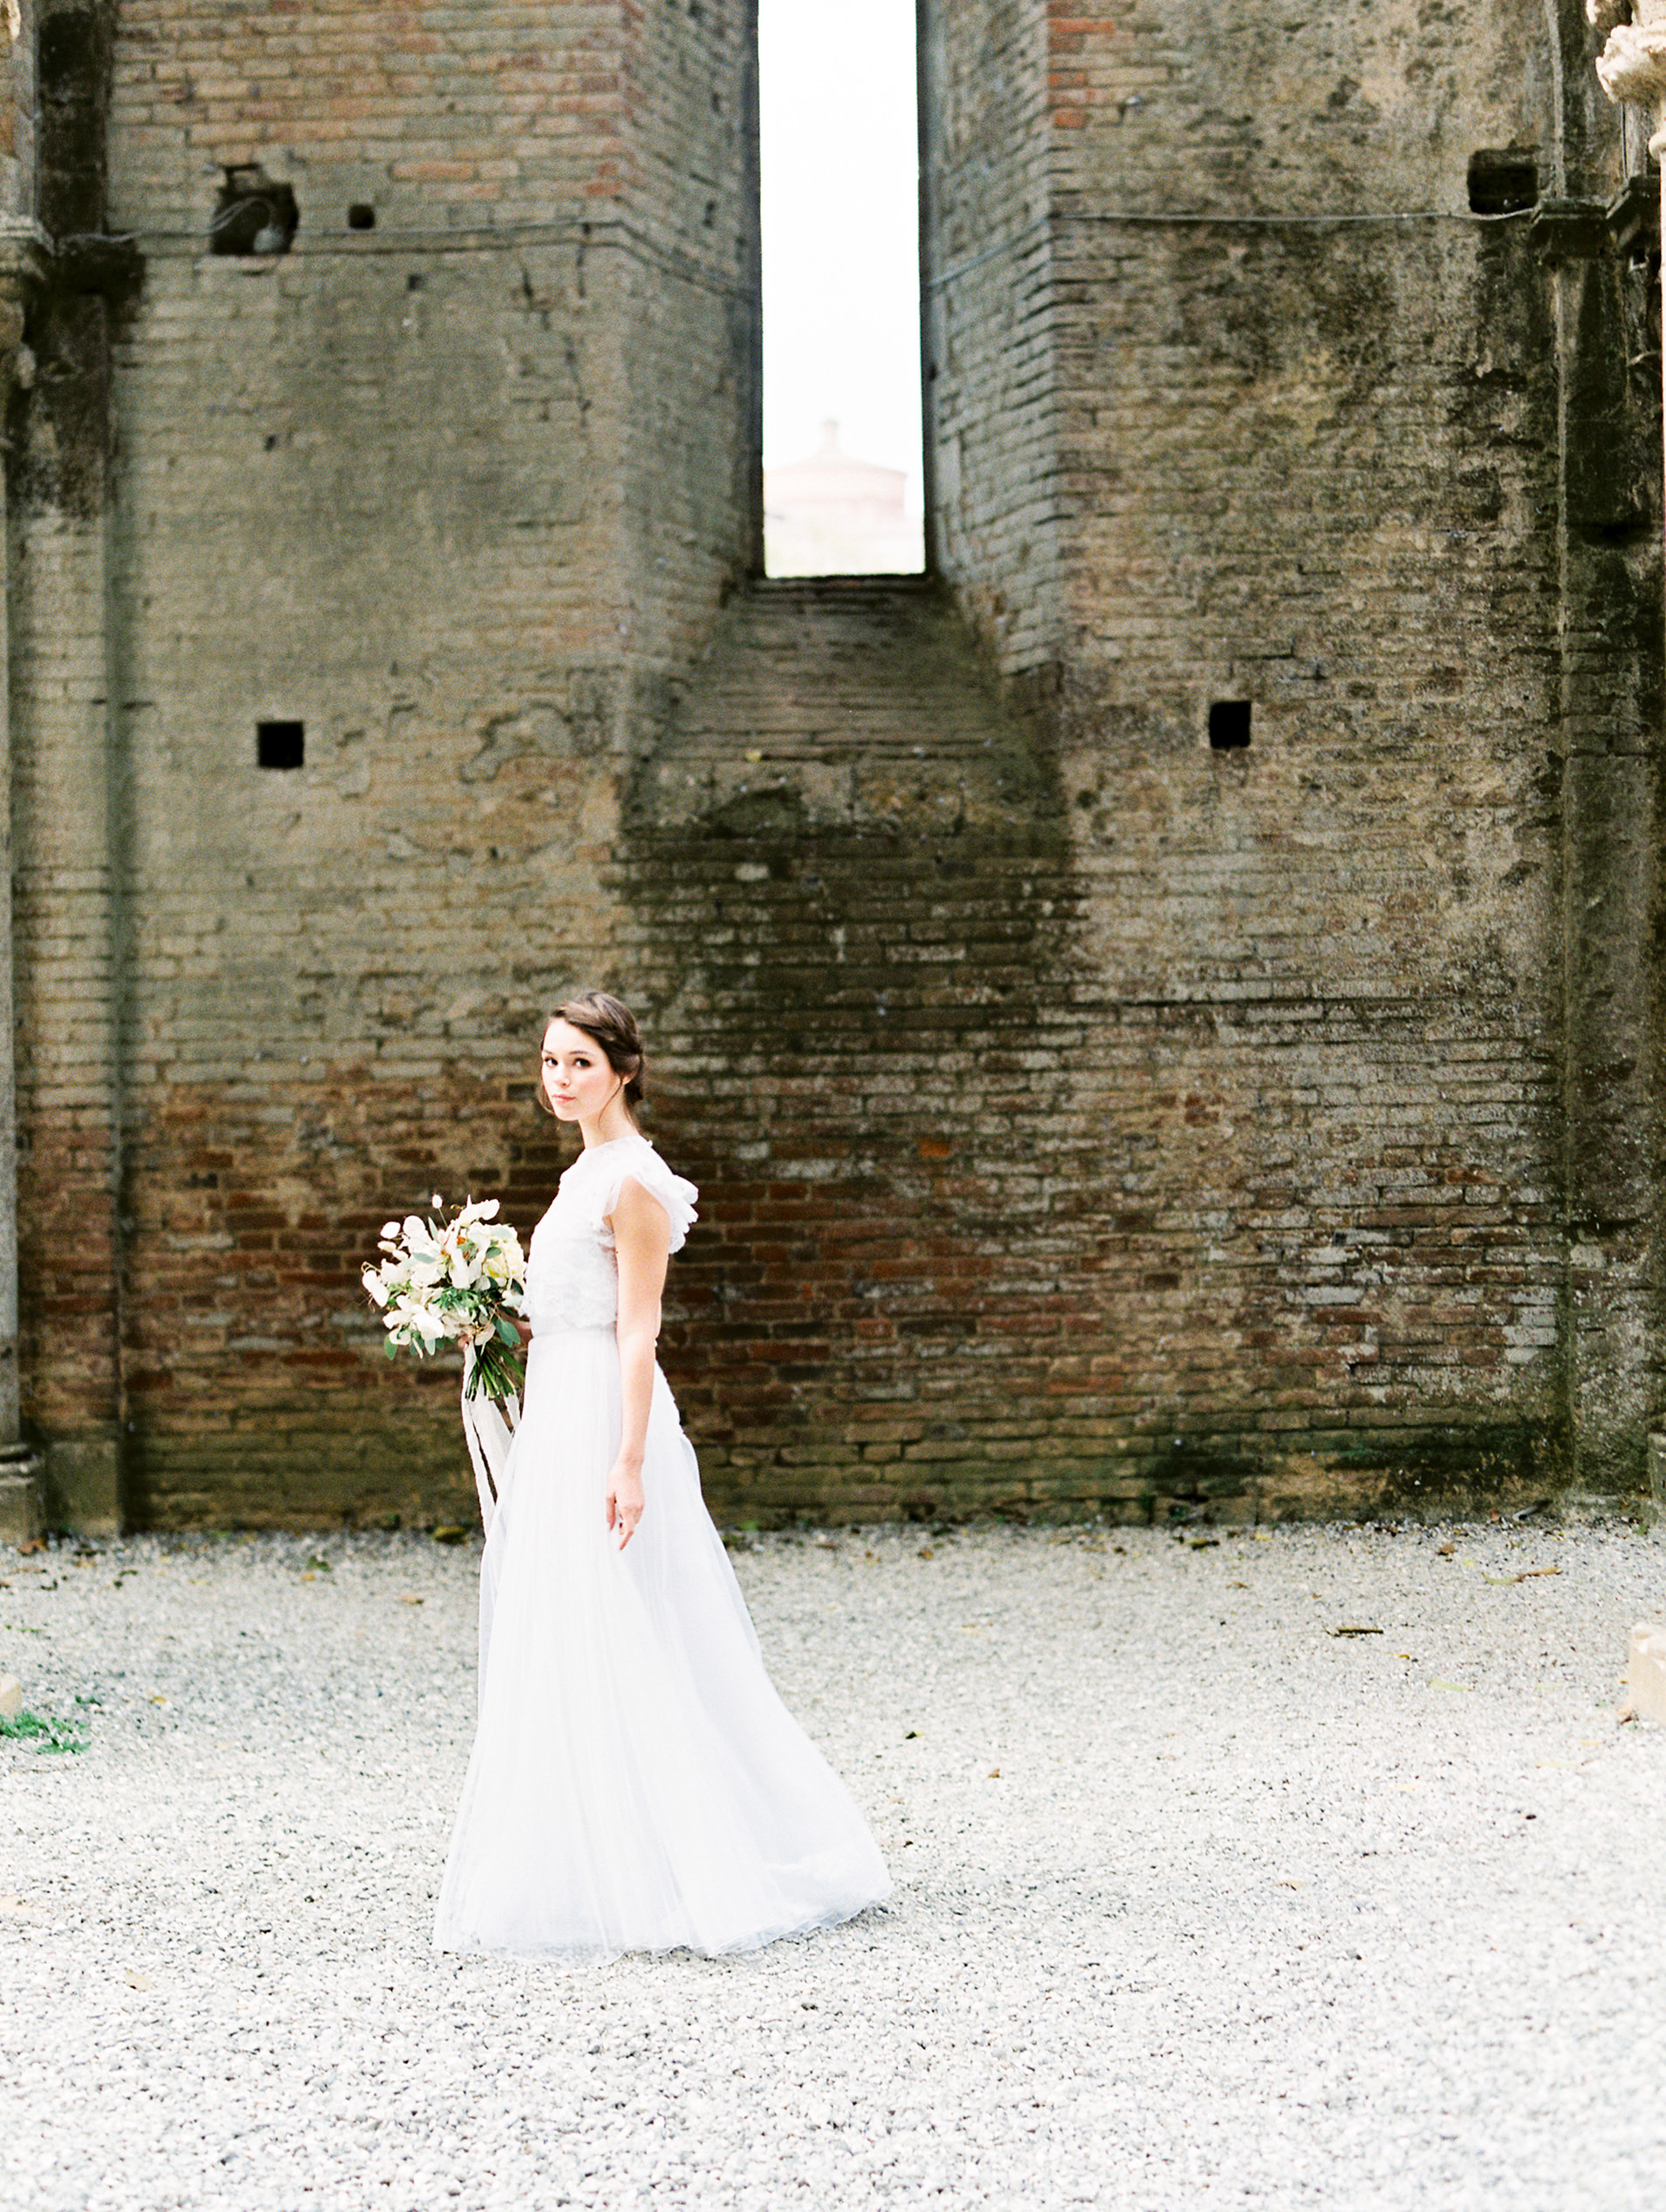 romantic-italy-wedding-in-tuscany-85.jpg